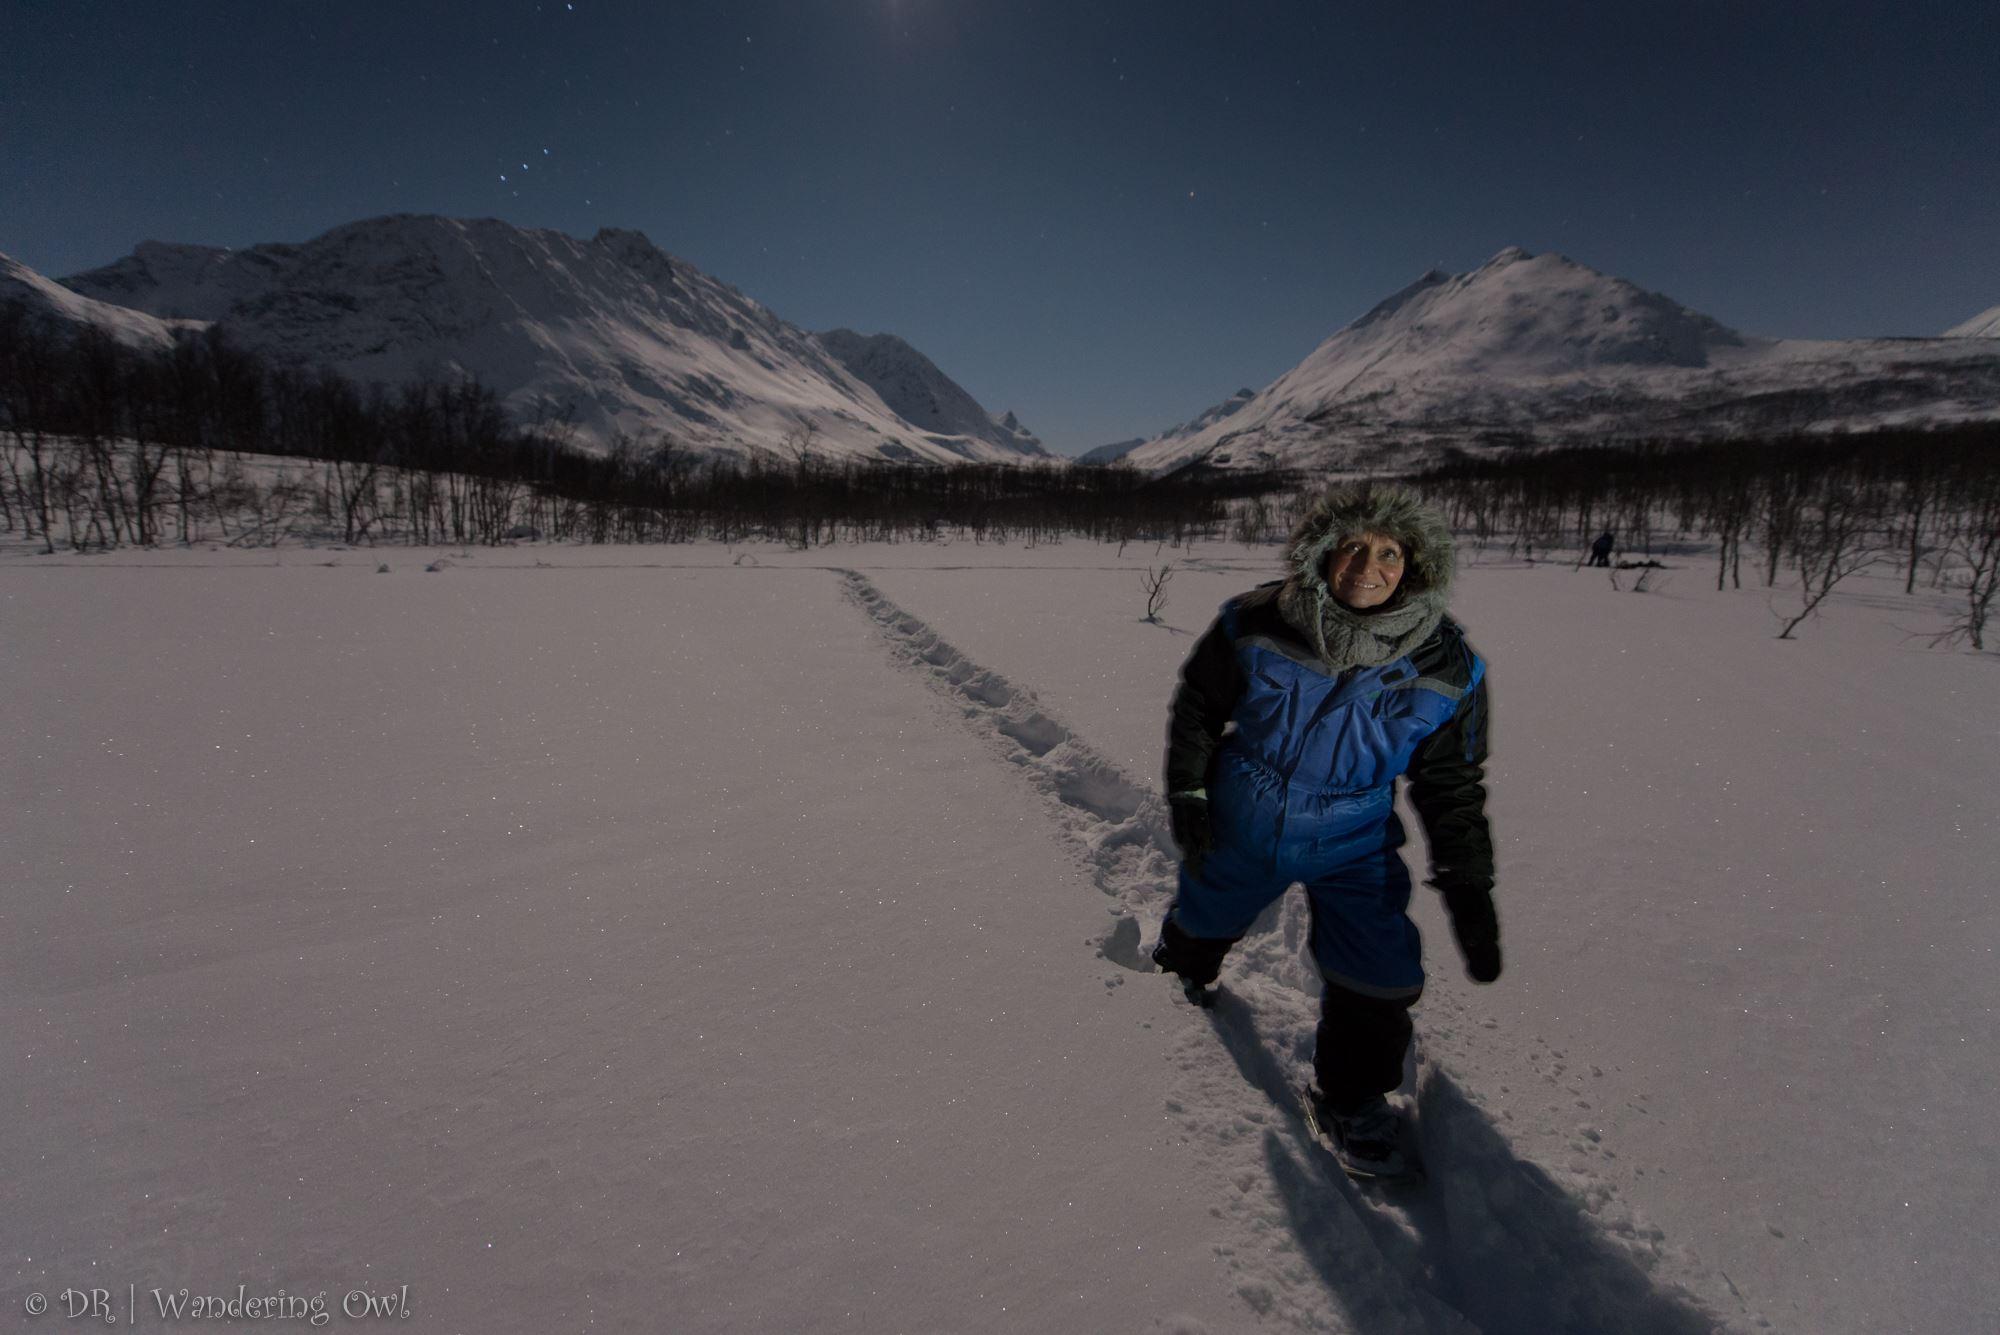 Star Walk – a night snowshoeing tour – Wandering Owl